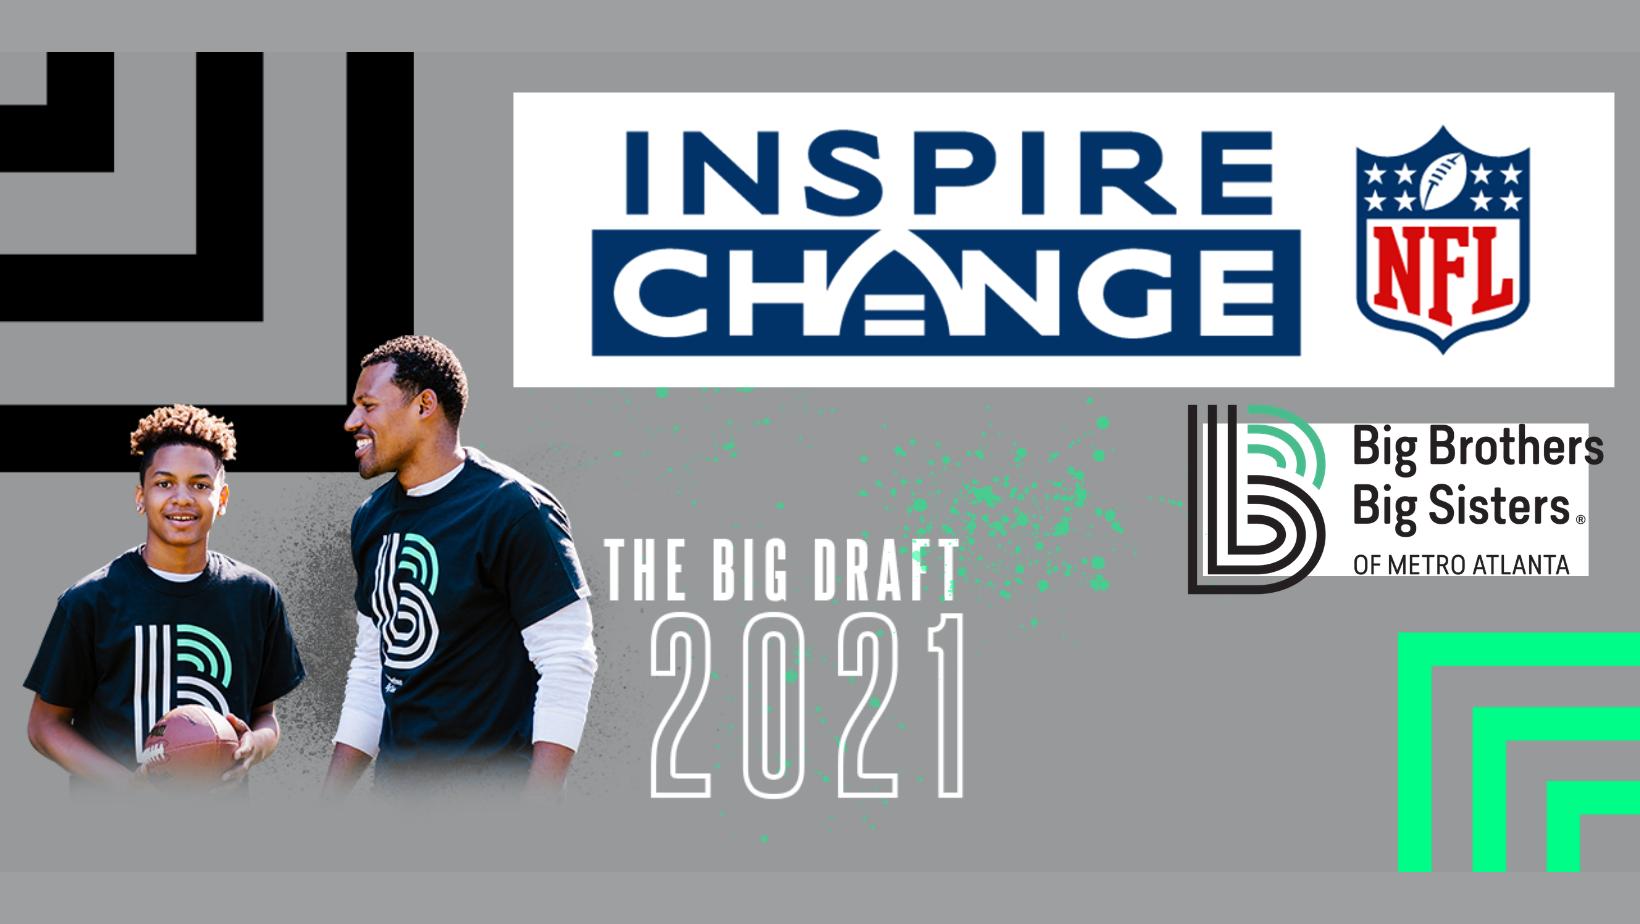 inspire change nfl big draft